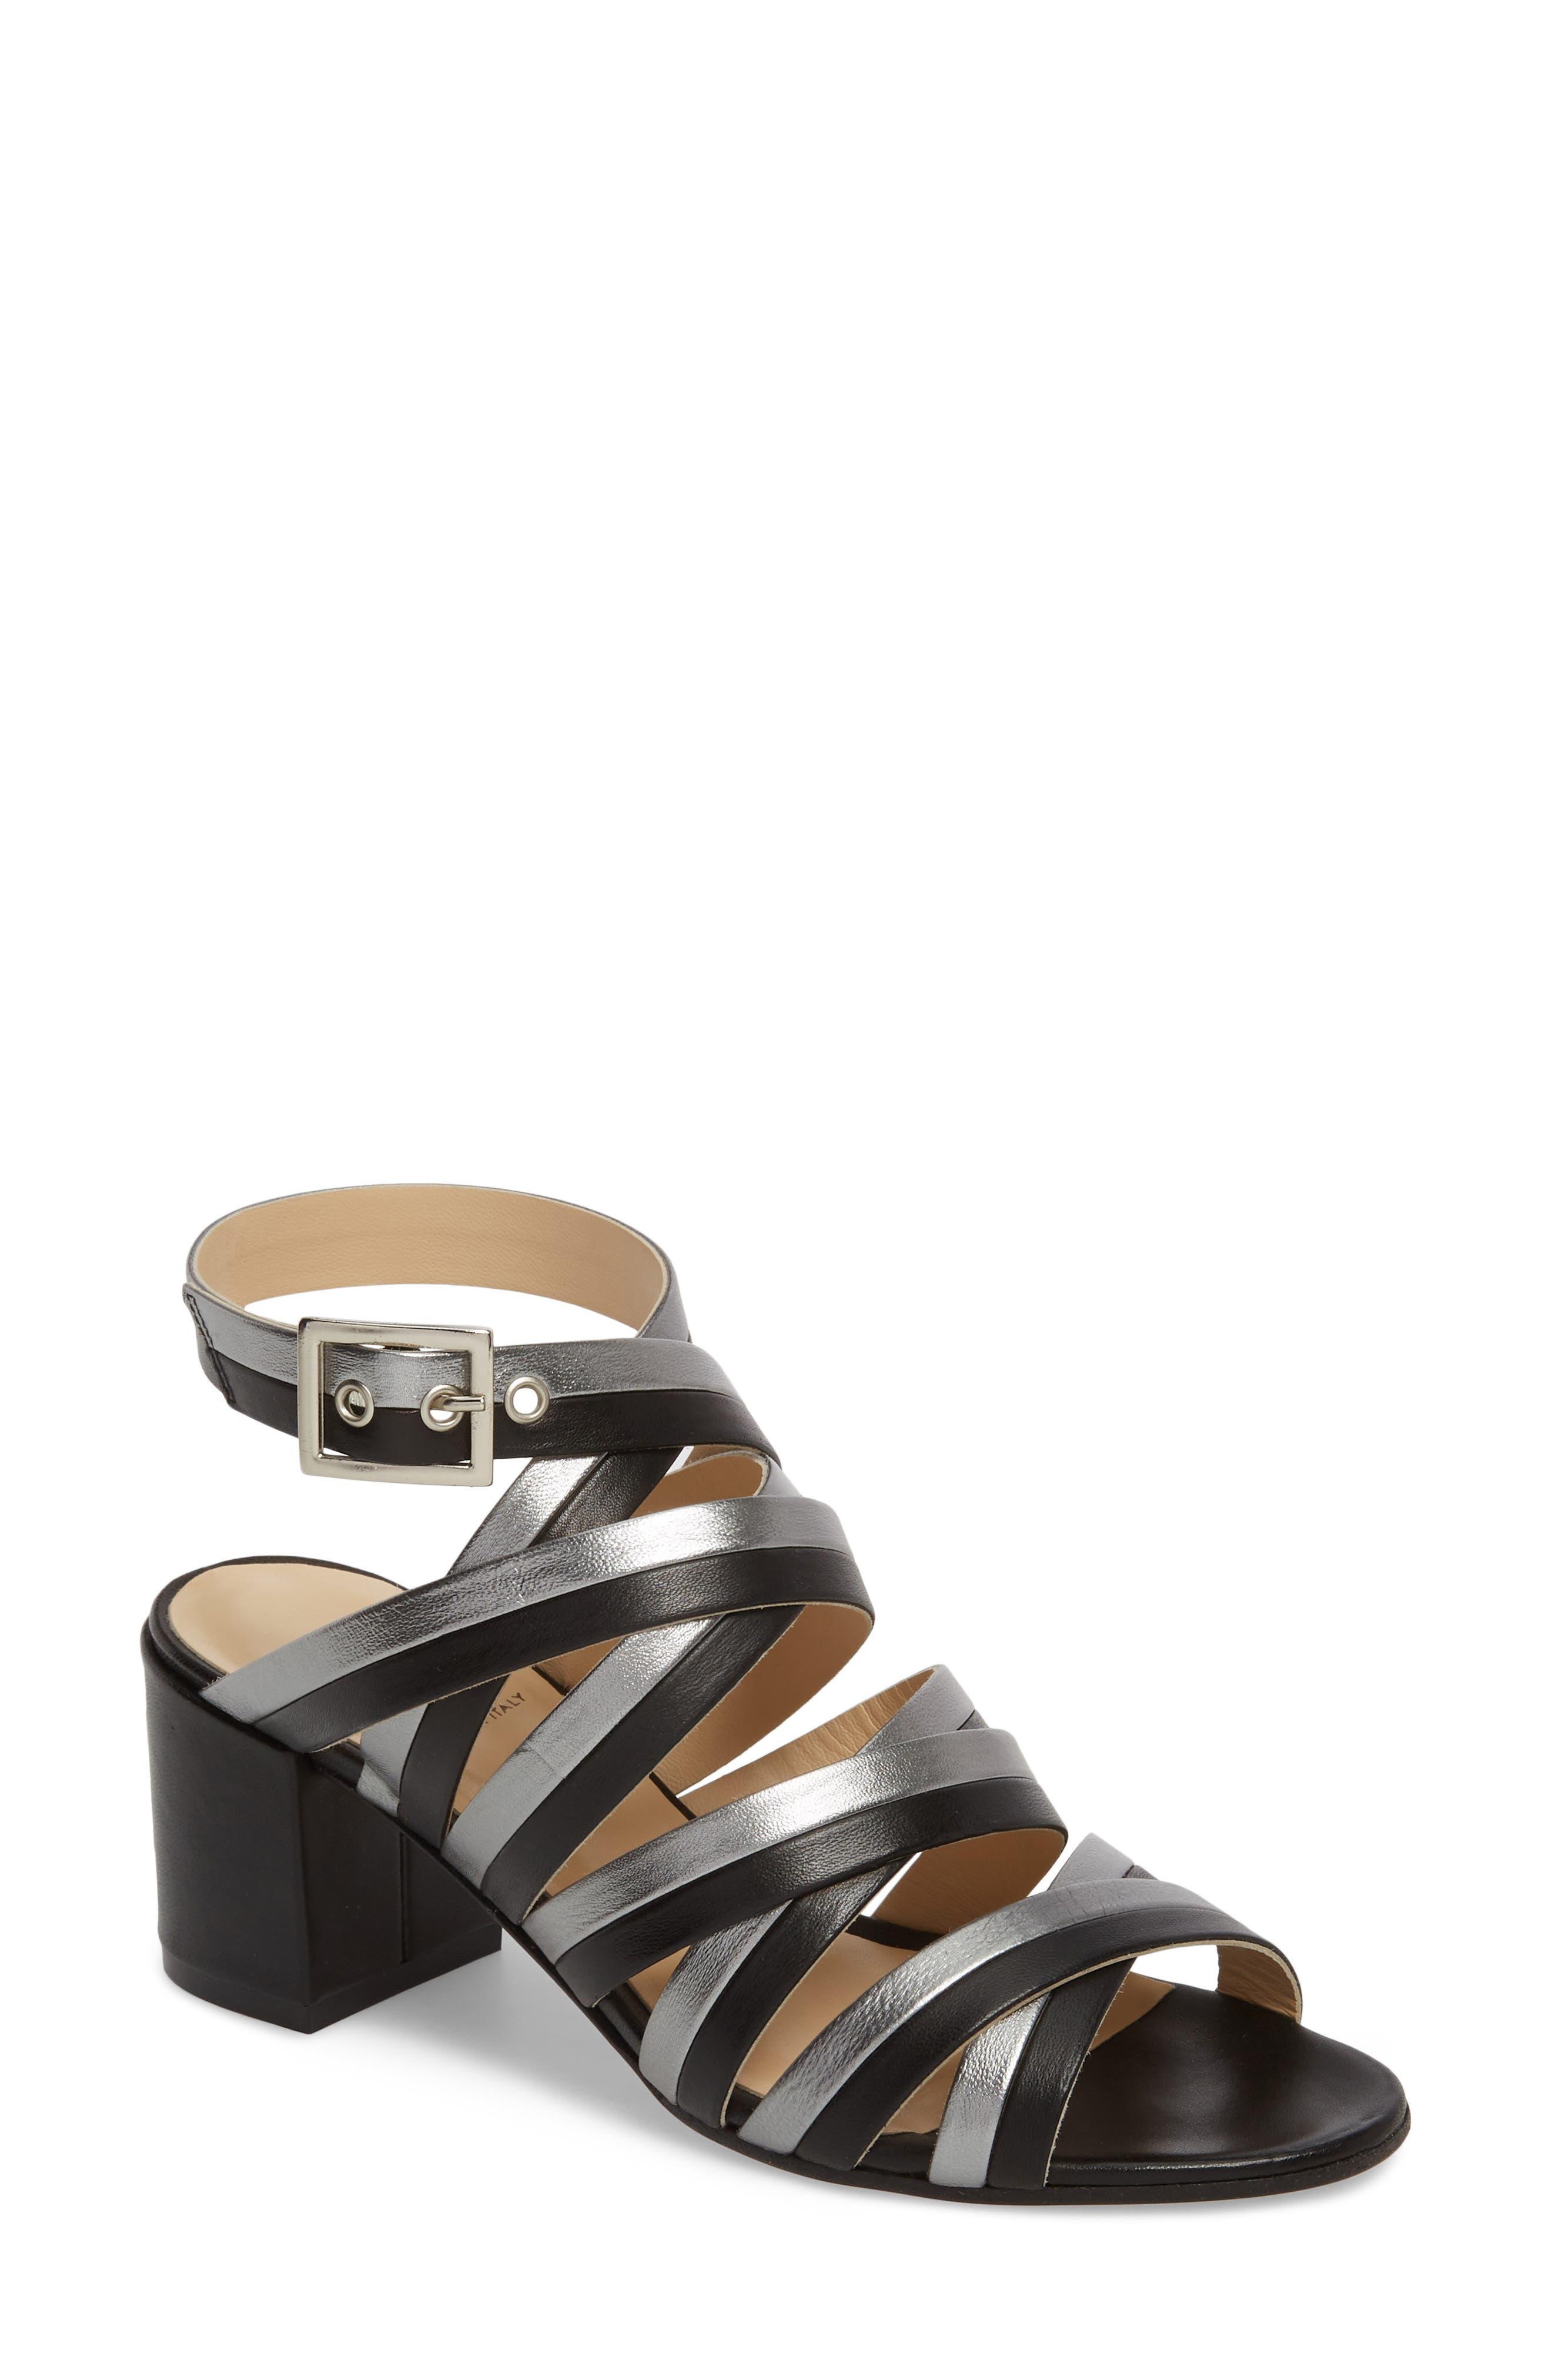 Leda Strappy Sandal,                         Main,                         color, BLACK LEATHER